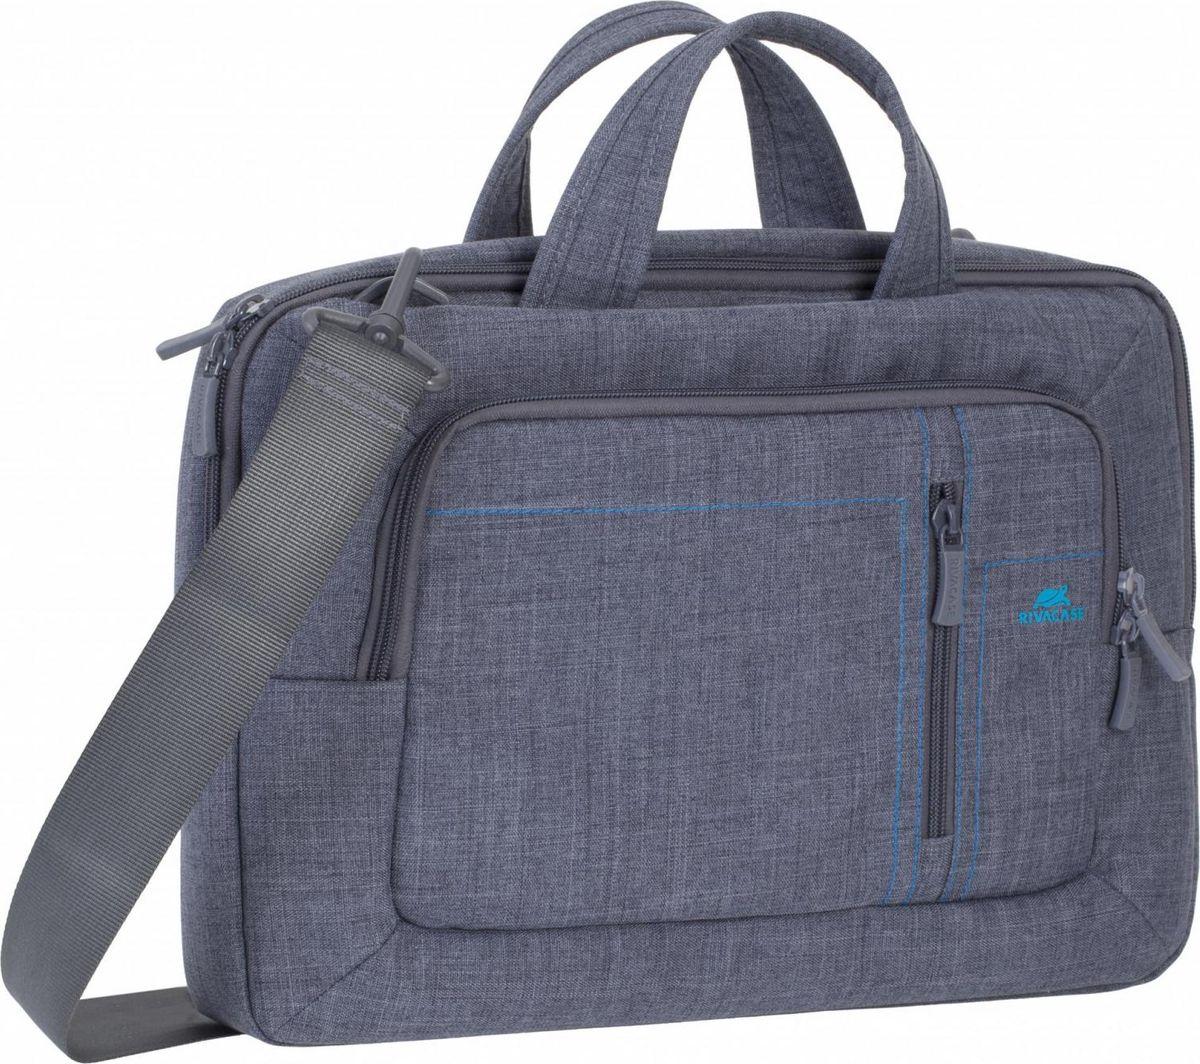 RivaCase 7520, Grey сумка для ноутбука 13,3